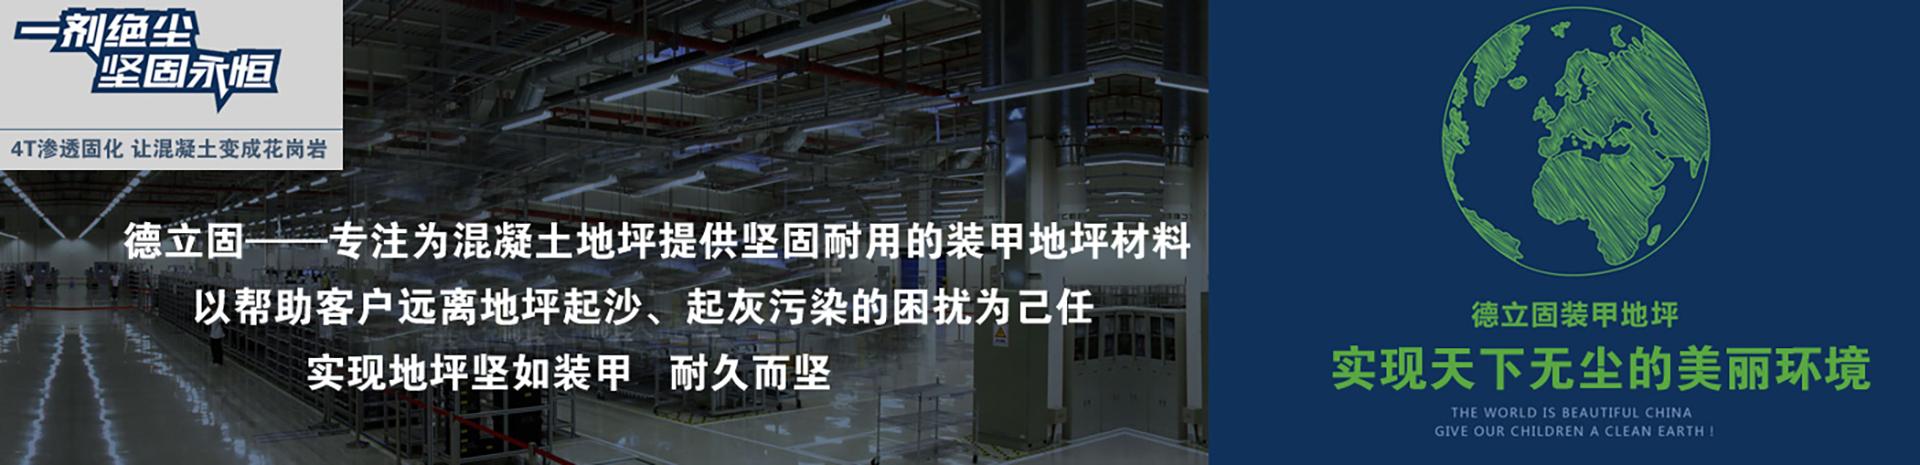 PC端幻灯四